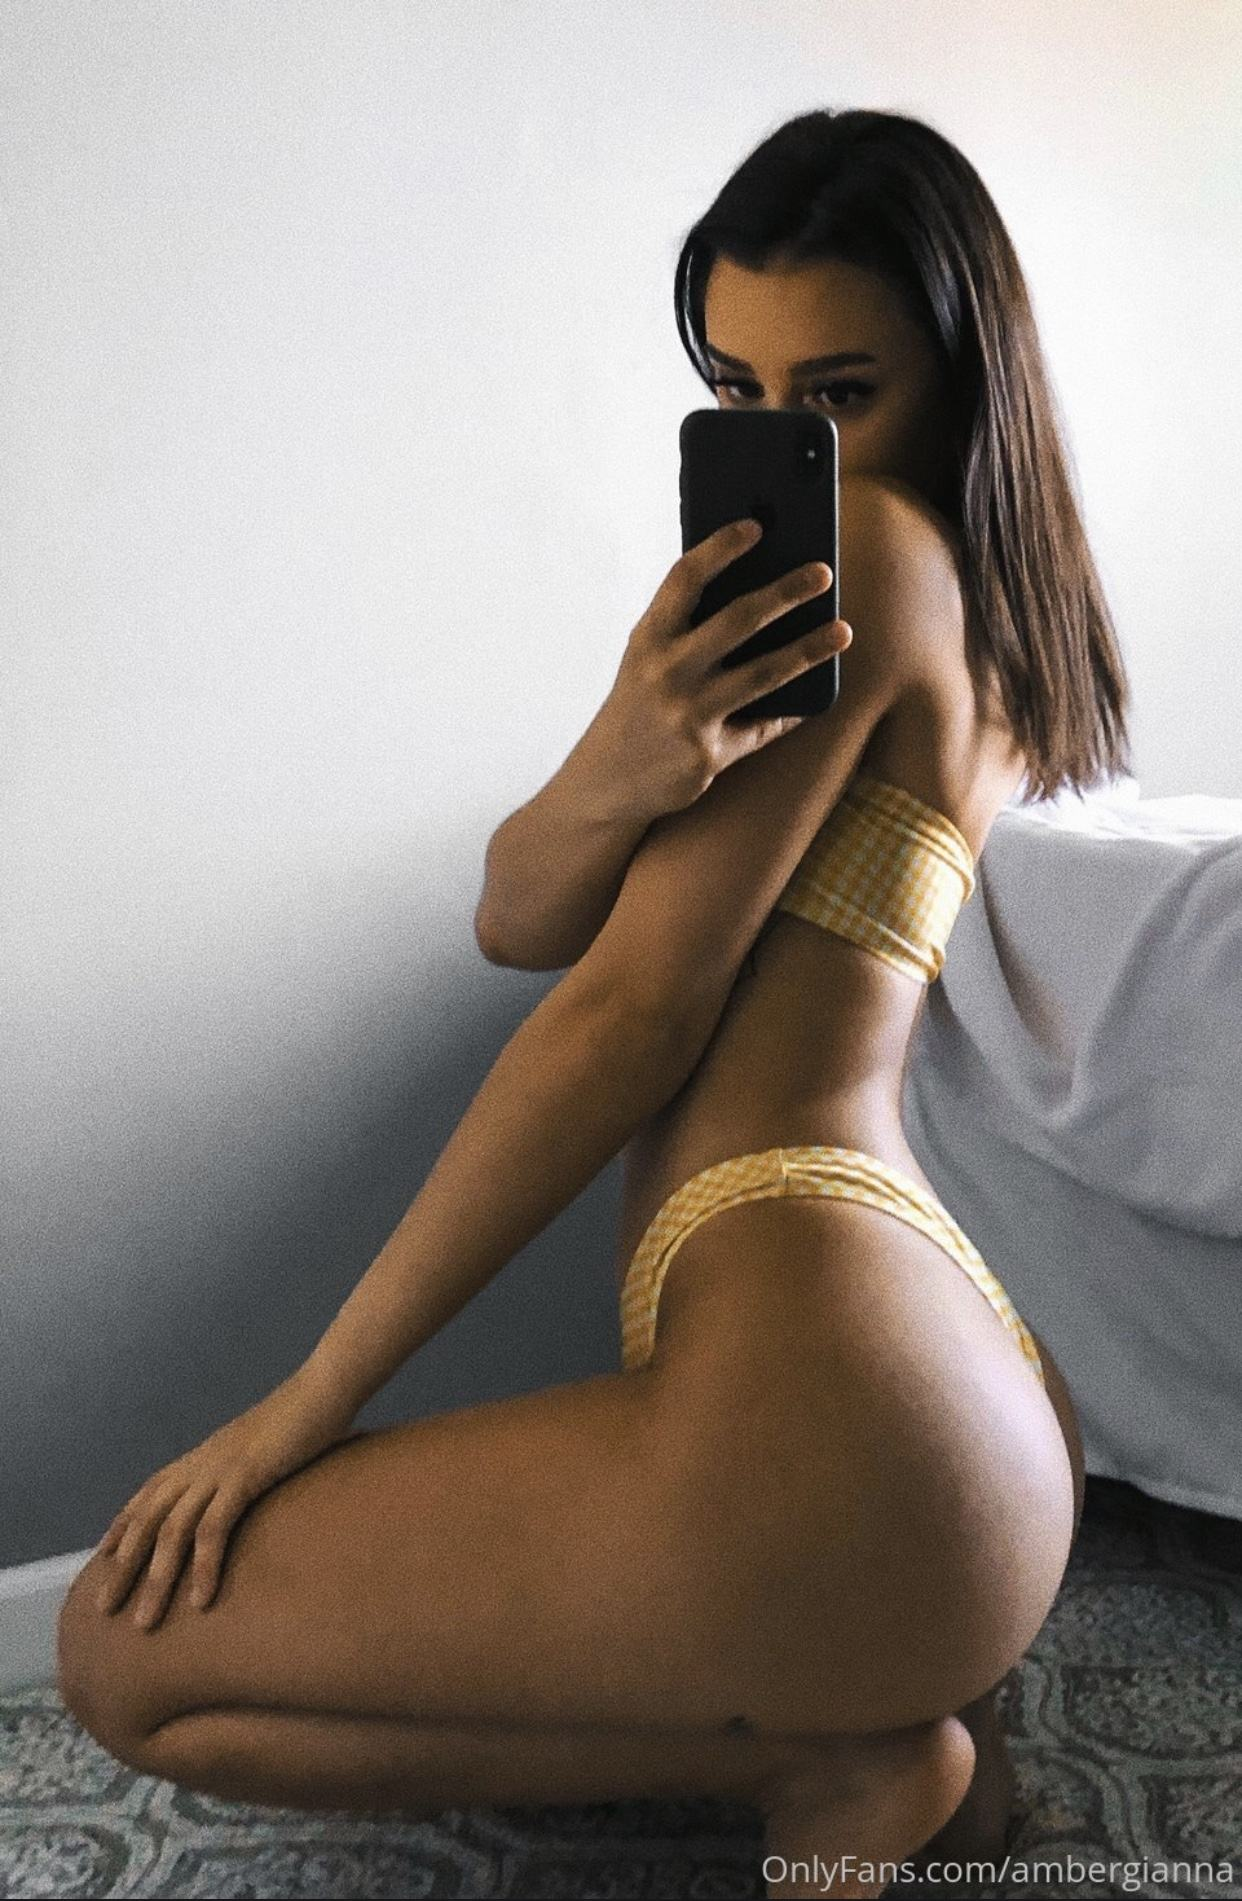 Amber Gianna Leaked 0117